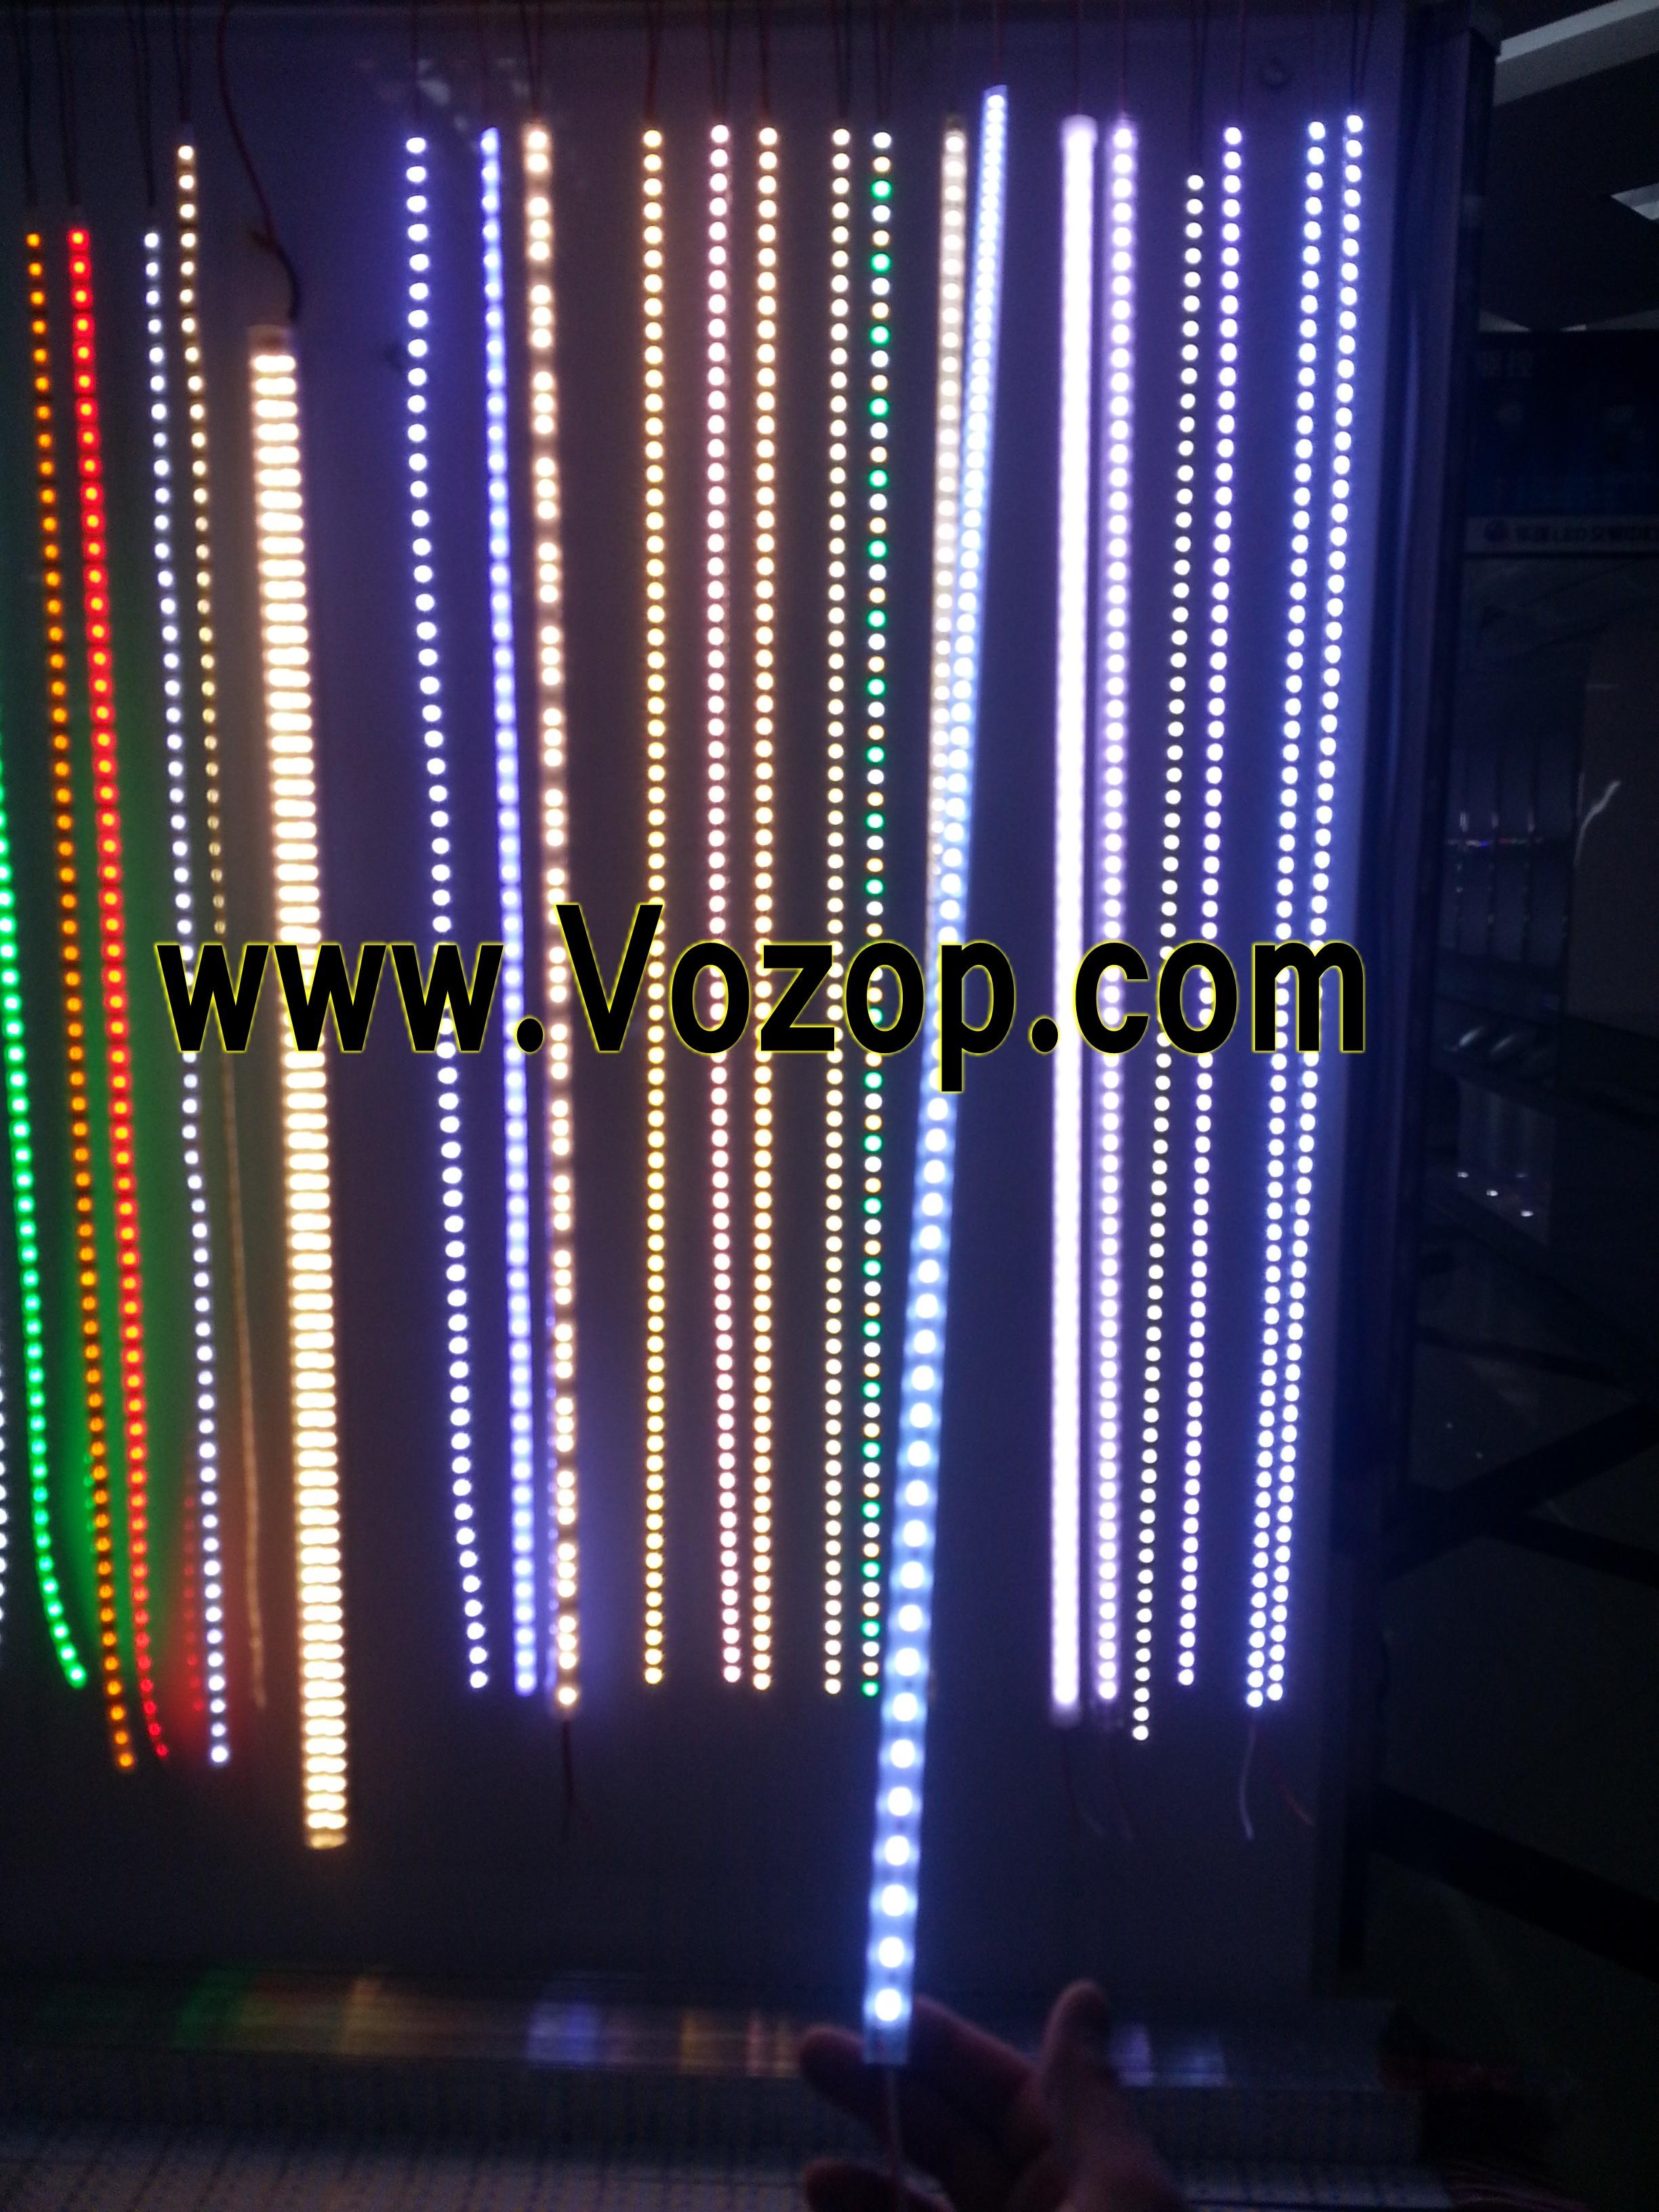 Micro_Aluminum_Channel_bar_for_LED_Strips_Light